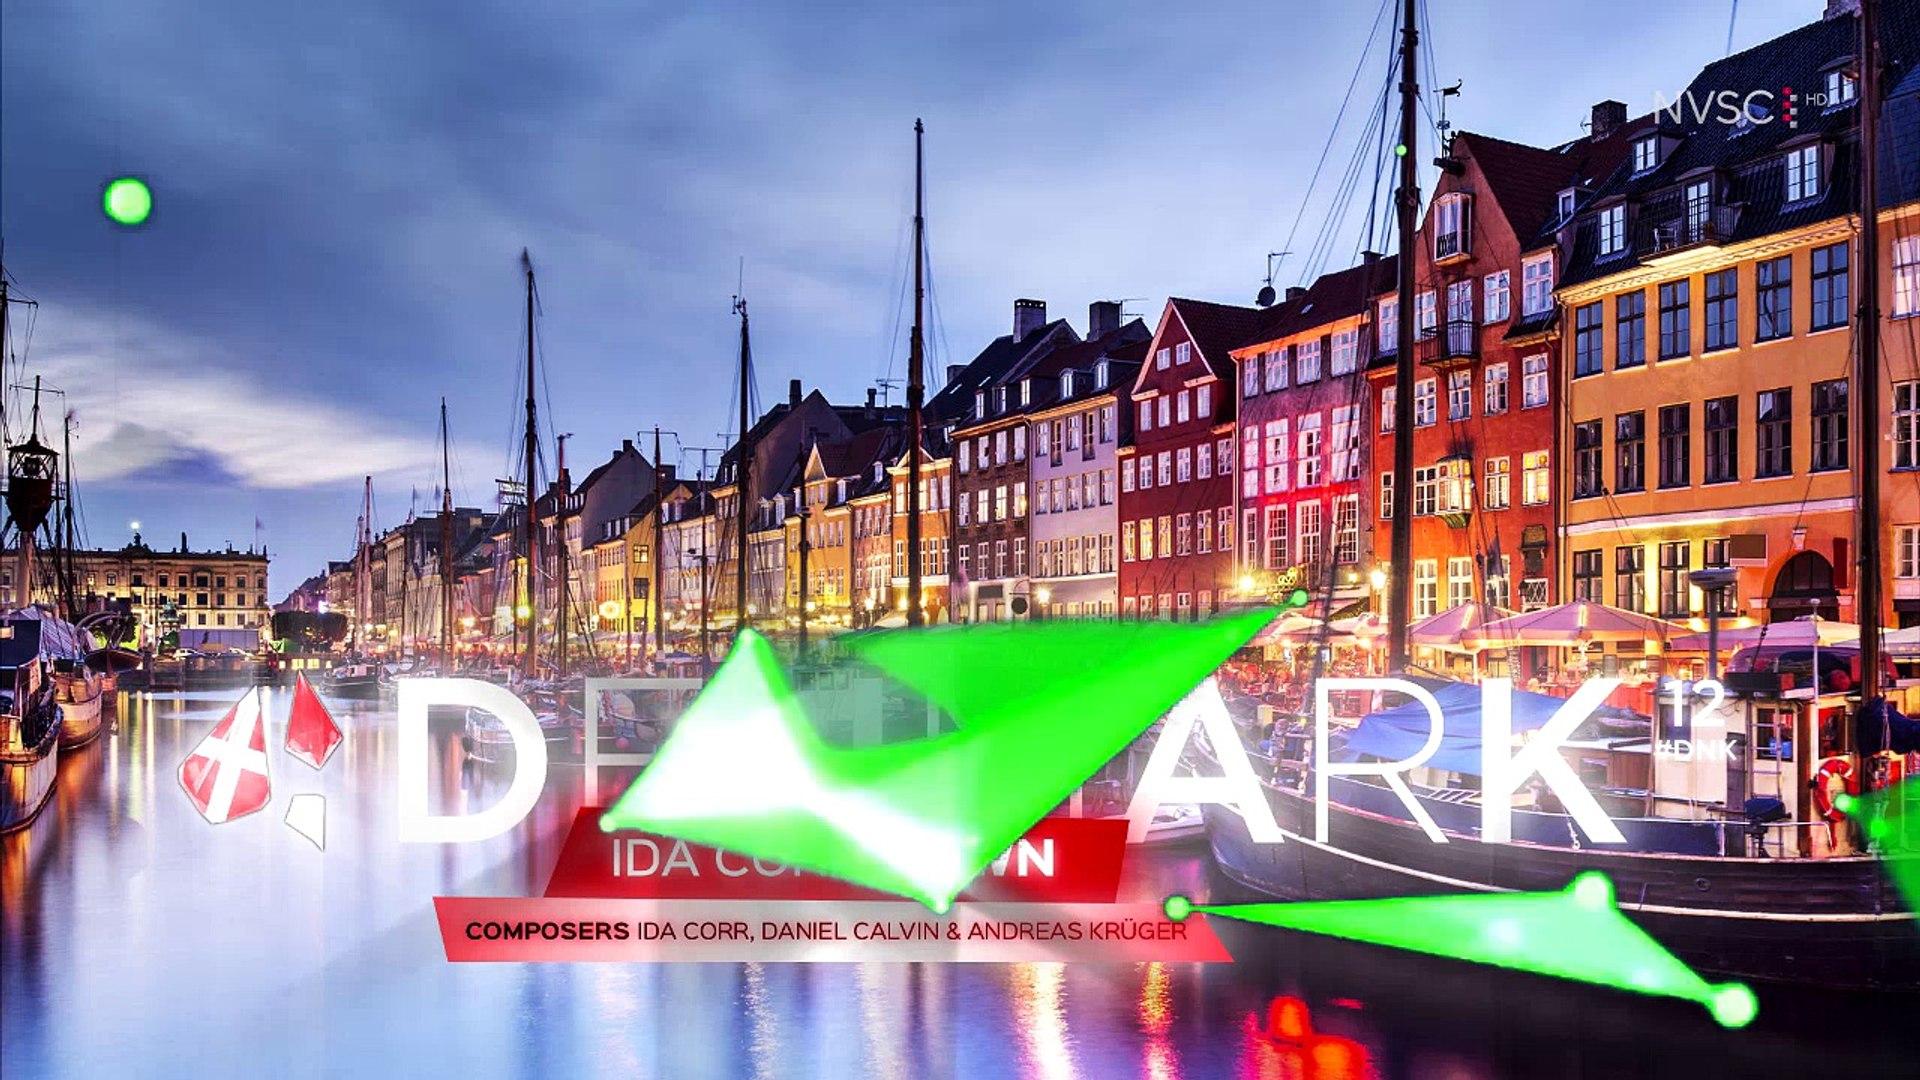 Ida Corr - Down (Denmark) (NVSC #19 Grand Final)